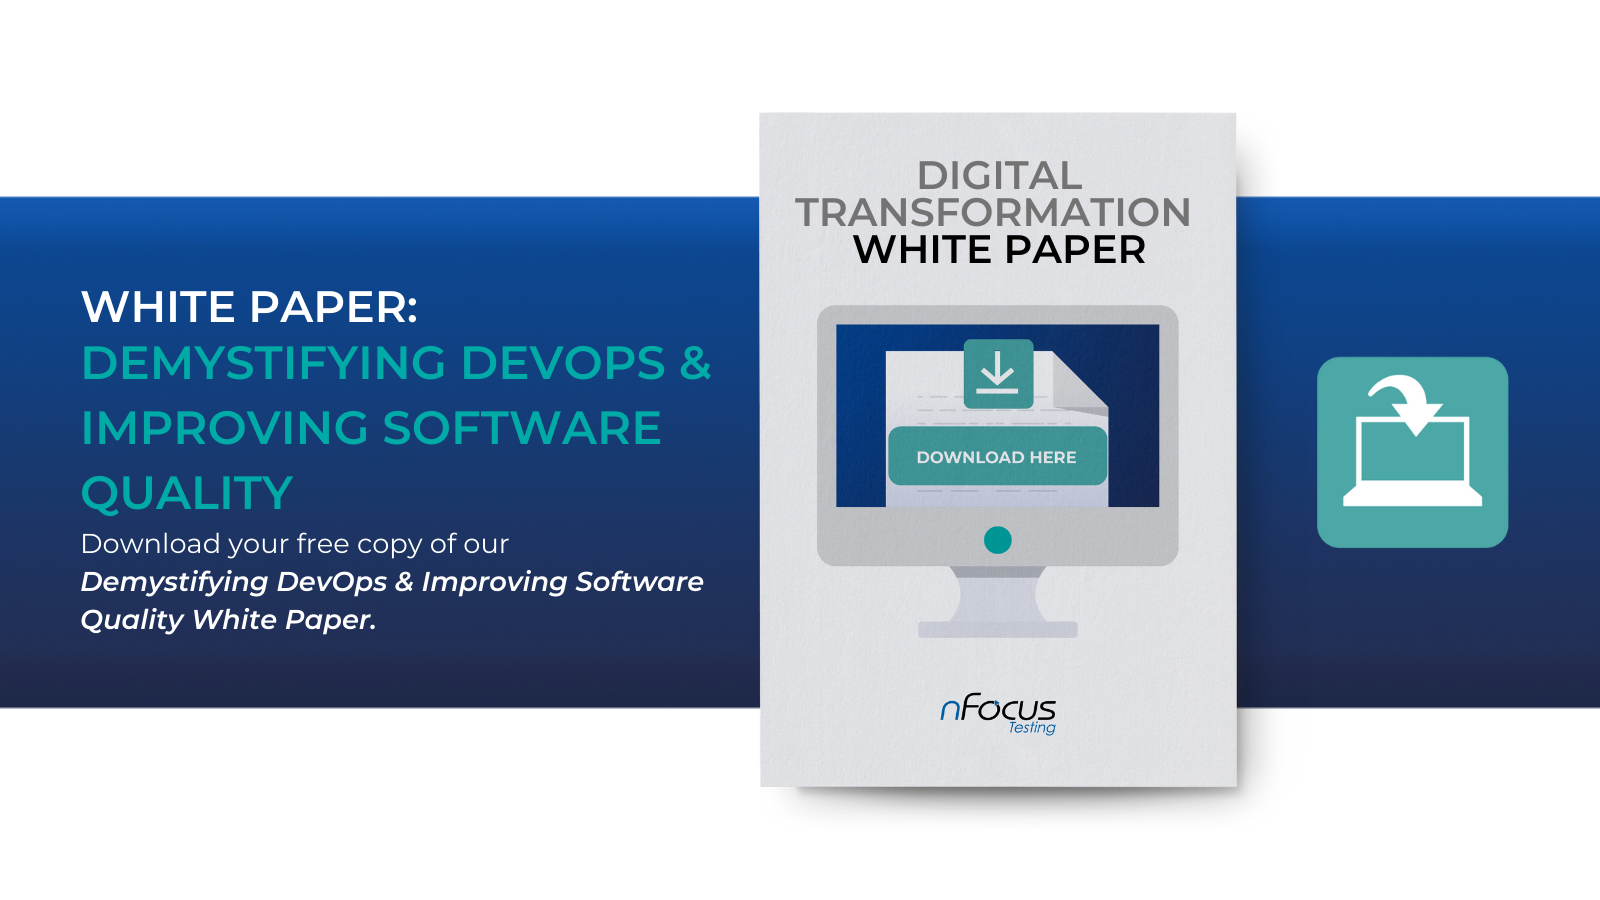 Demystifying DevOps & Improving Software Quality